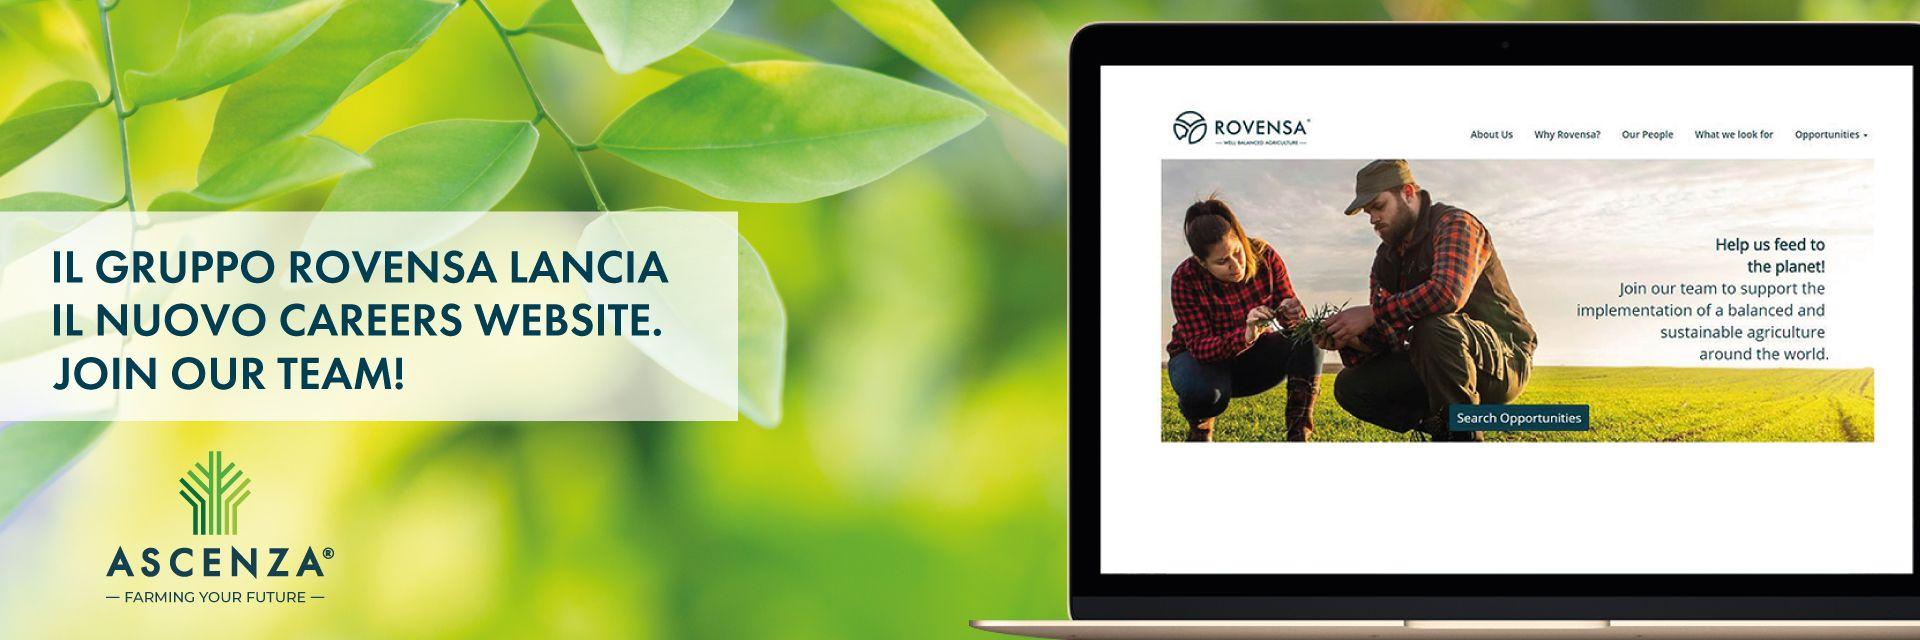 Rovensa Carreers website